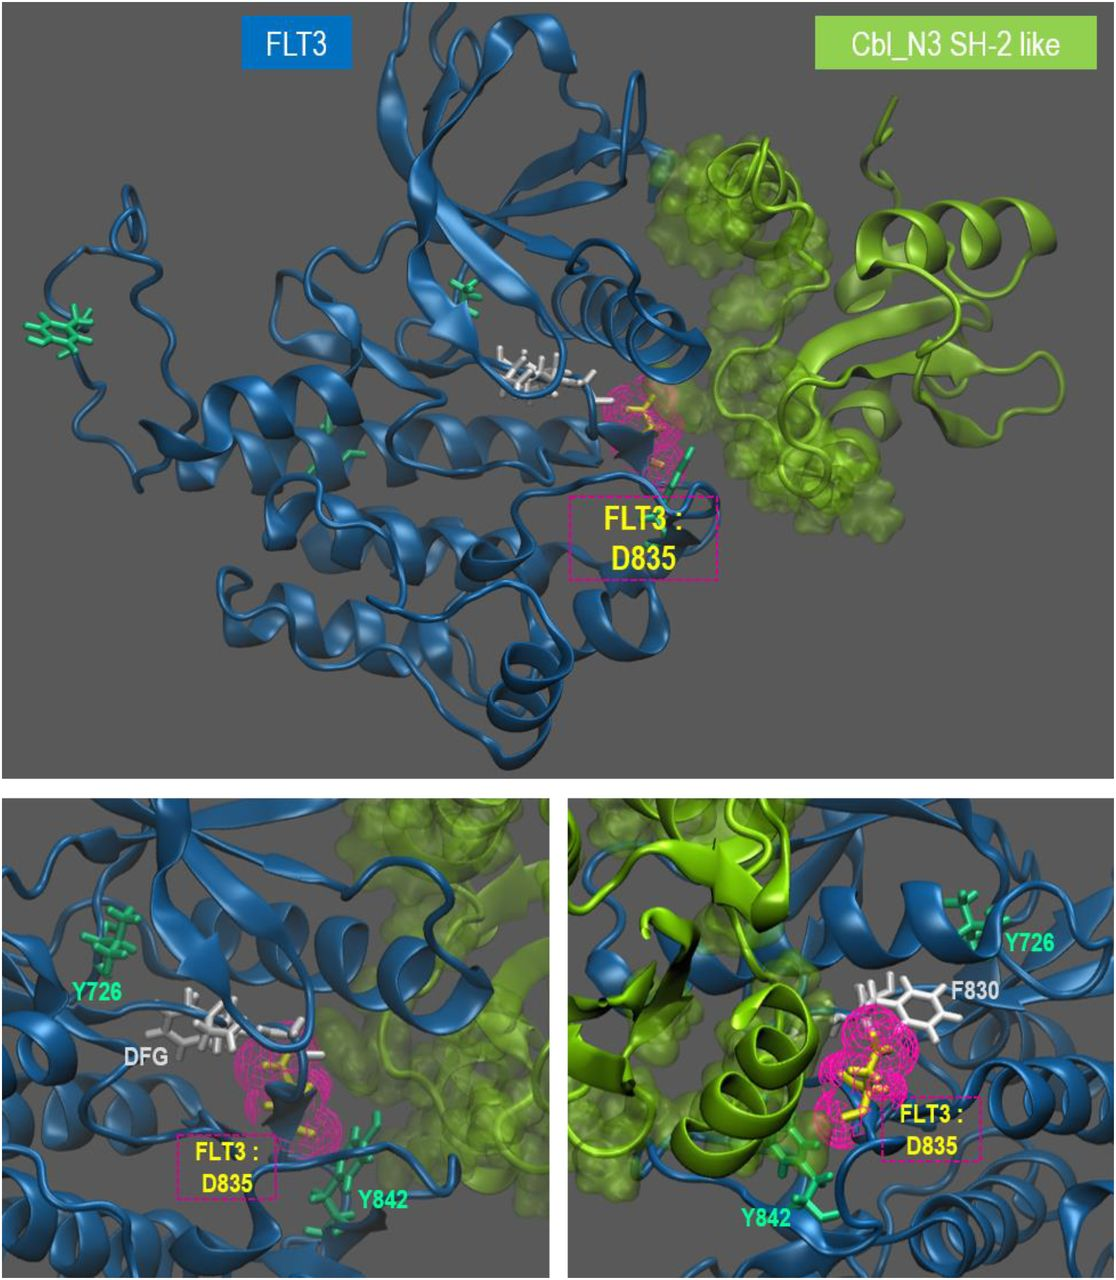 Short loop motif profiling of protein interaction networks in acute